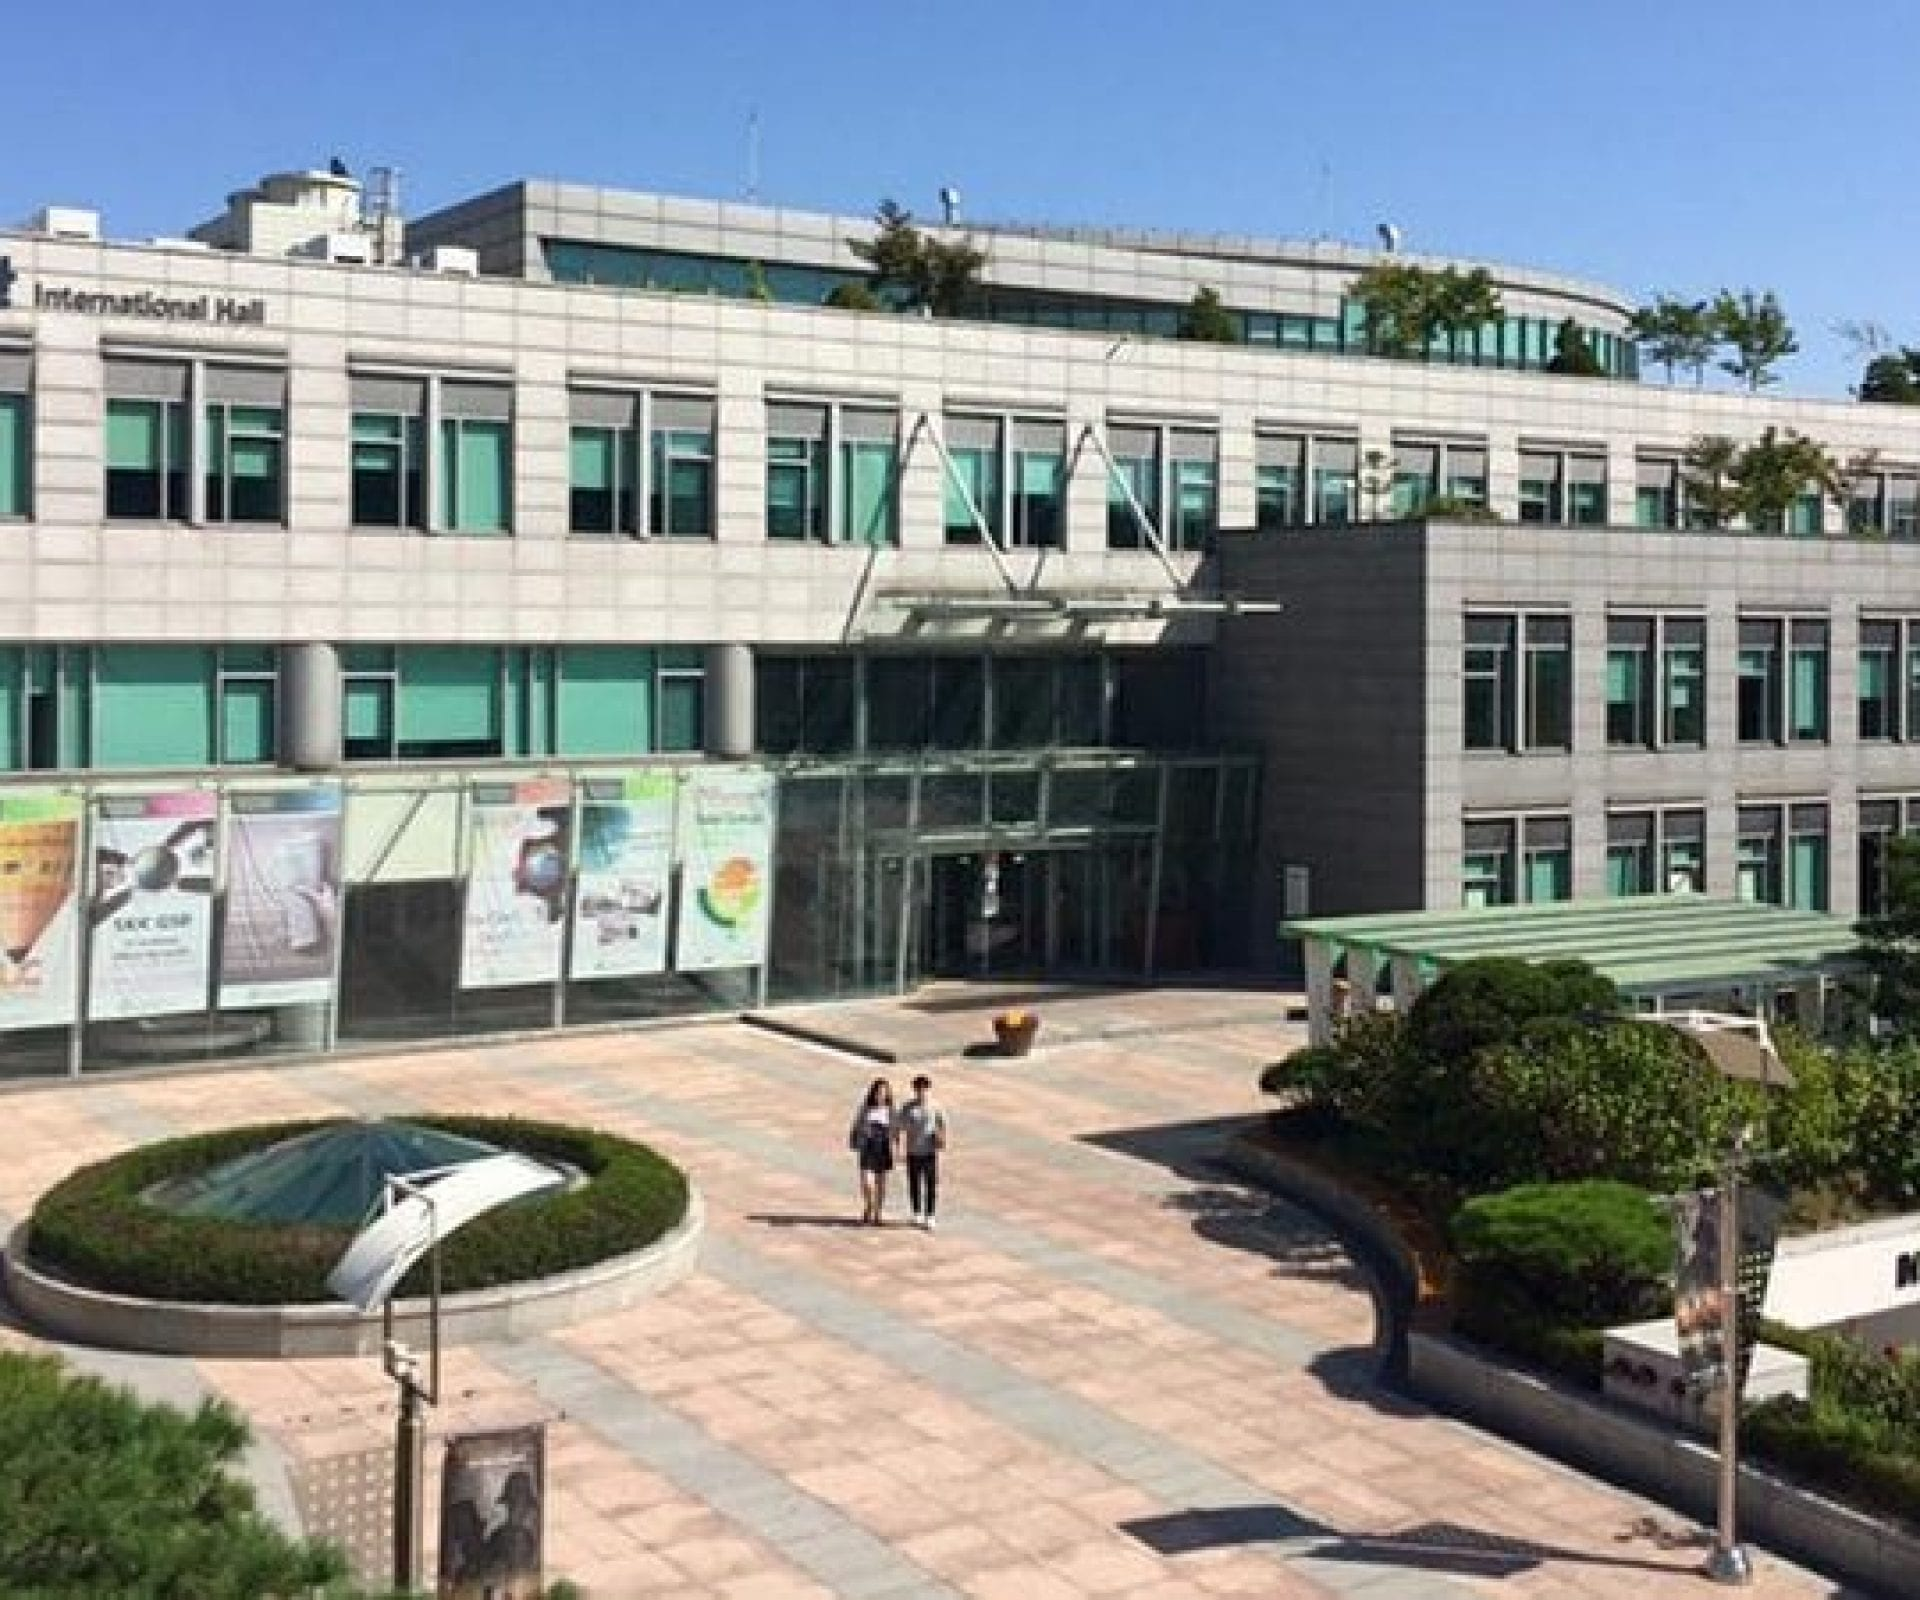 Sungkyunkwan University | Jongno-gu, Seoul